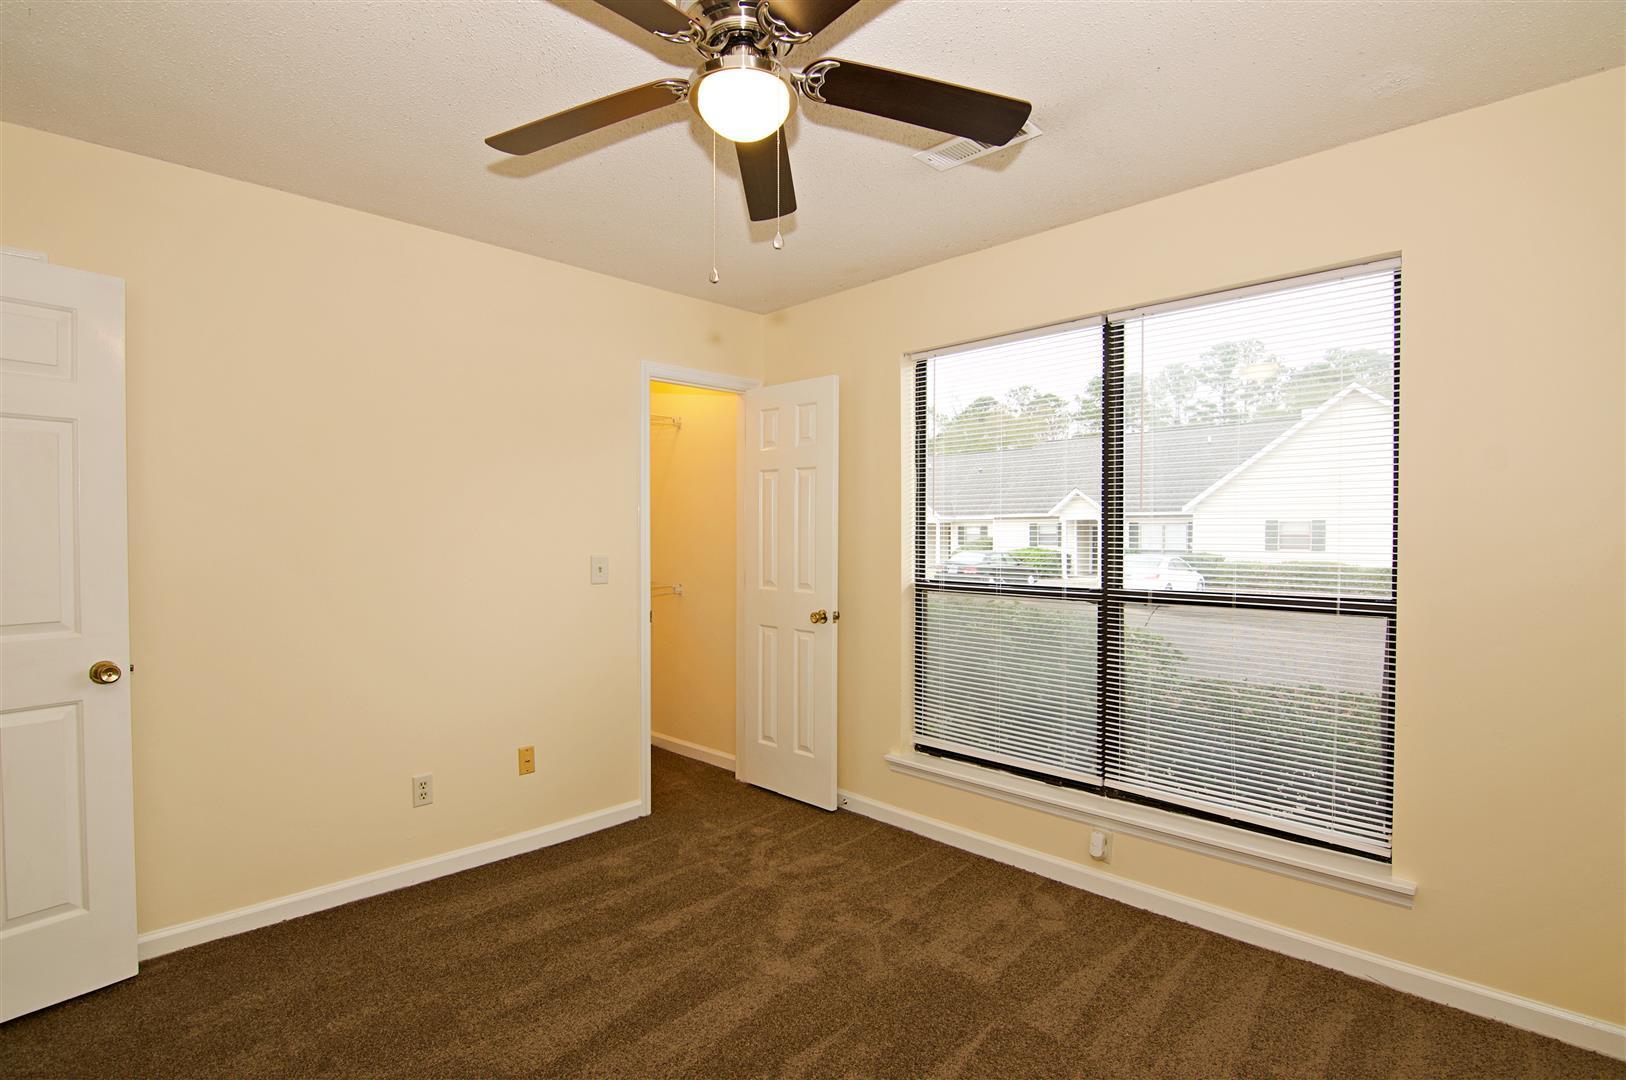 Shaftesbury Woods Homes For Sale - 931 Estates, Charleston, SC - 2